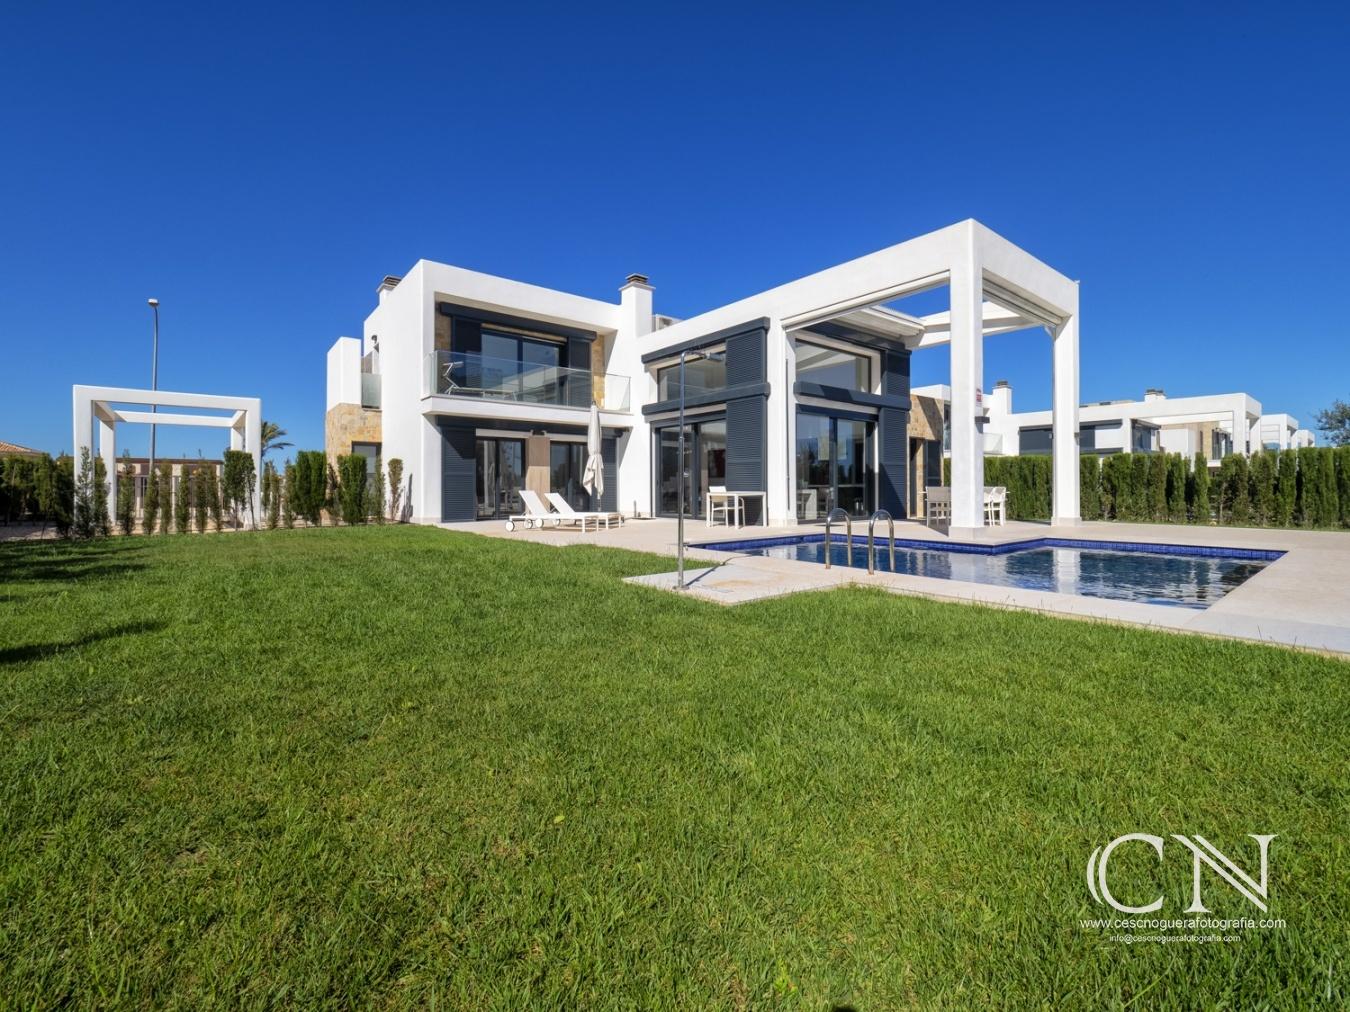 Casa a Cala Murada - Cesc Noguera Fotografie, Wenn Fotografie ist eine Leidenschaft, Architectural & Interior design photographer / Landscape Photography